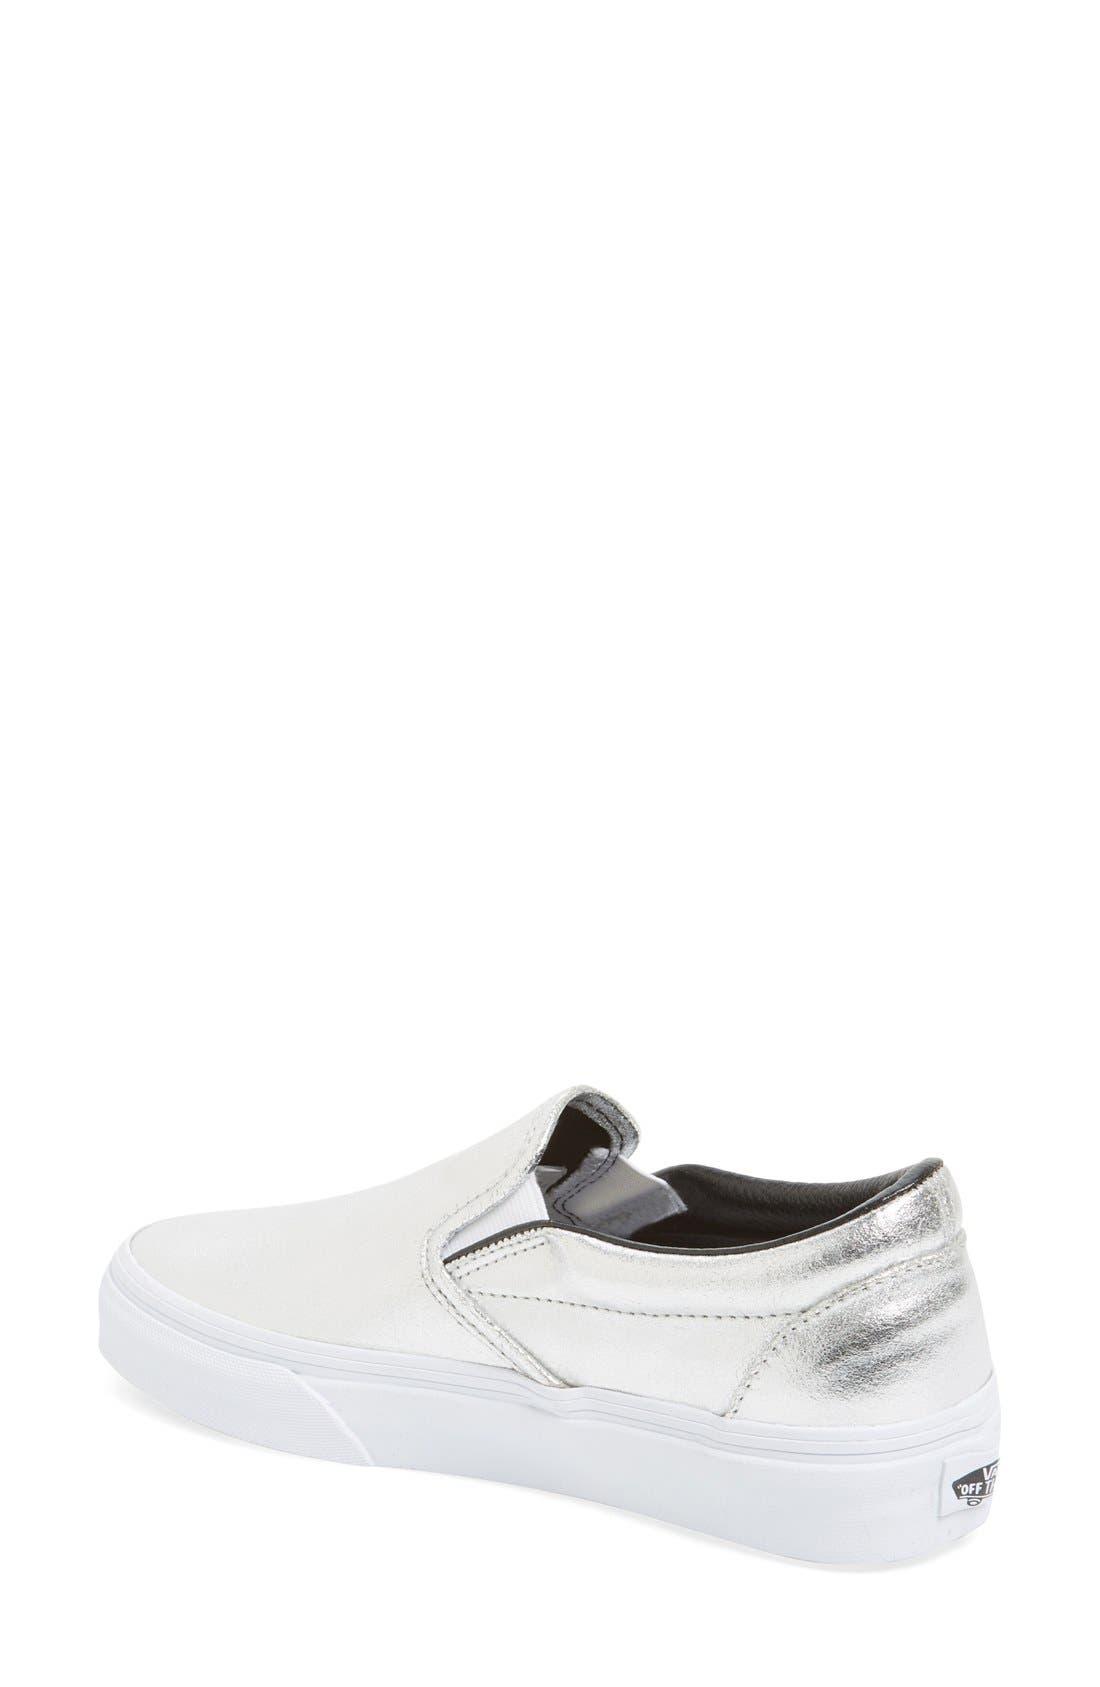 Alternate Image 2  - Vans Metallic Leather Slip-On Sneaker (Women)